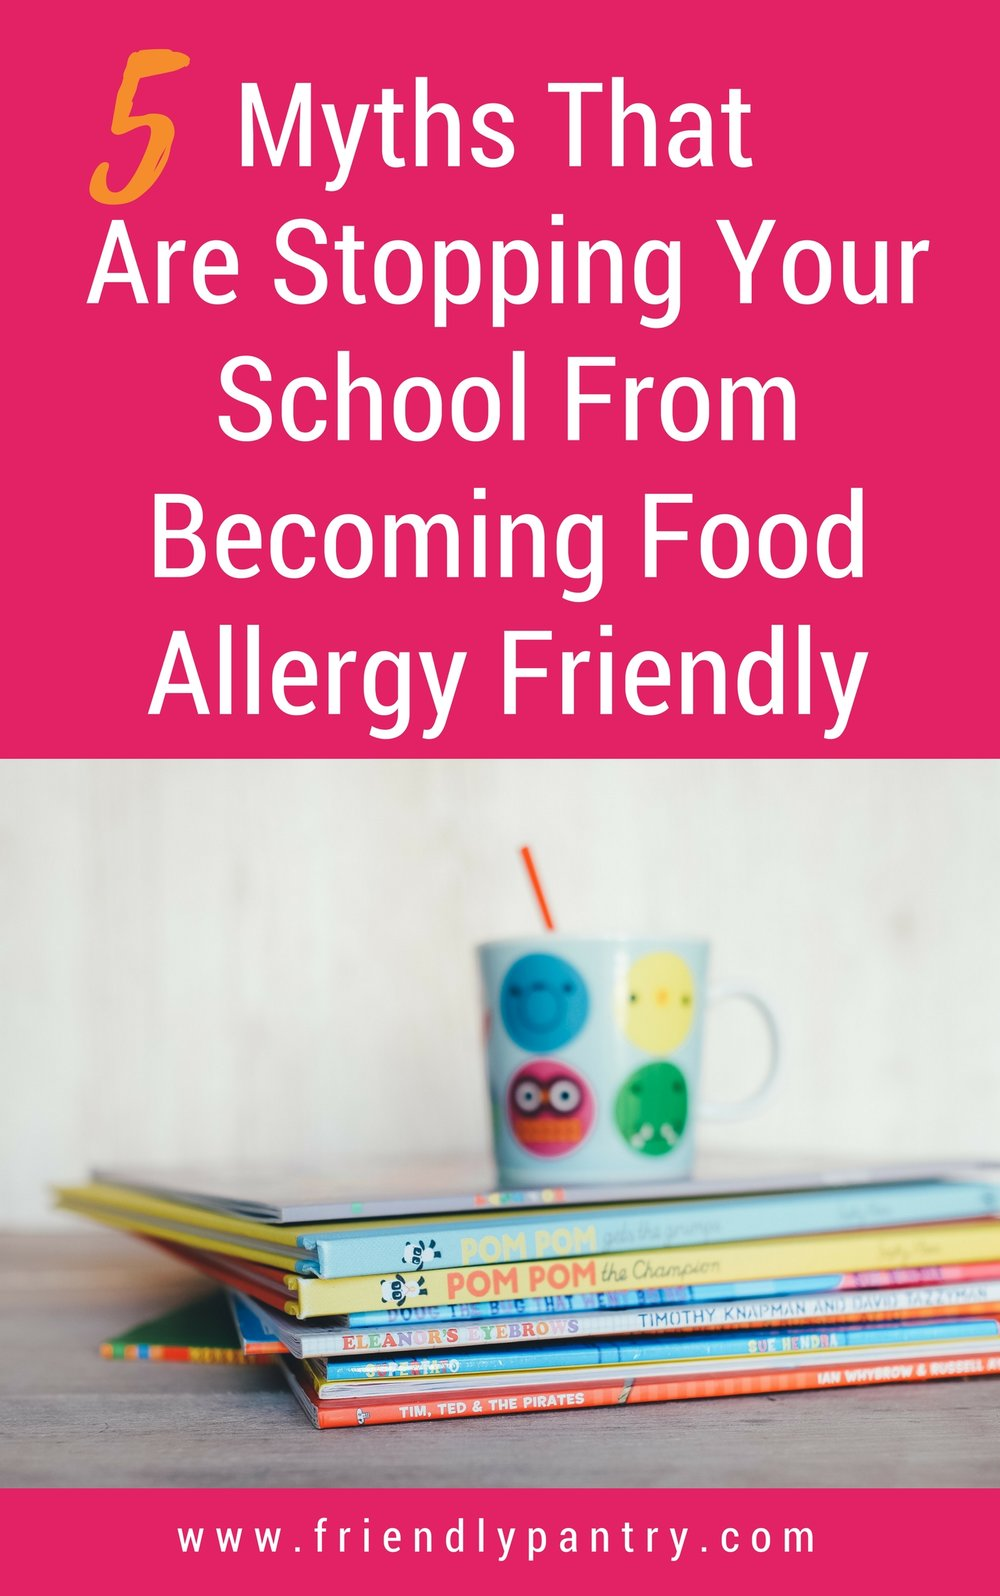 Help for Food Allergies at School